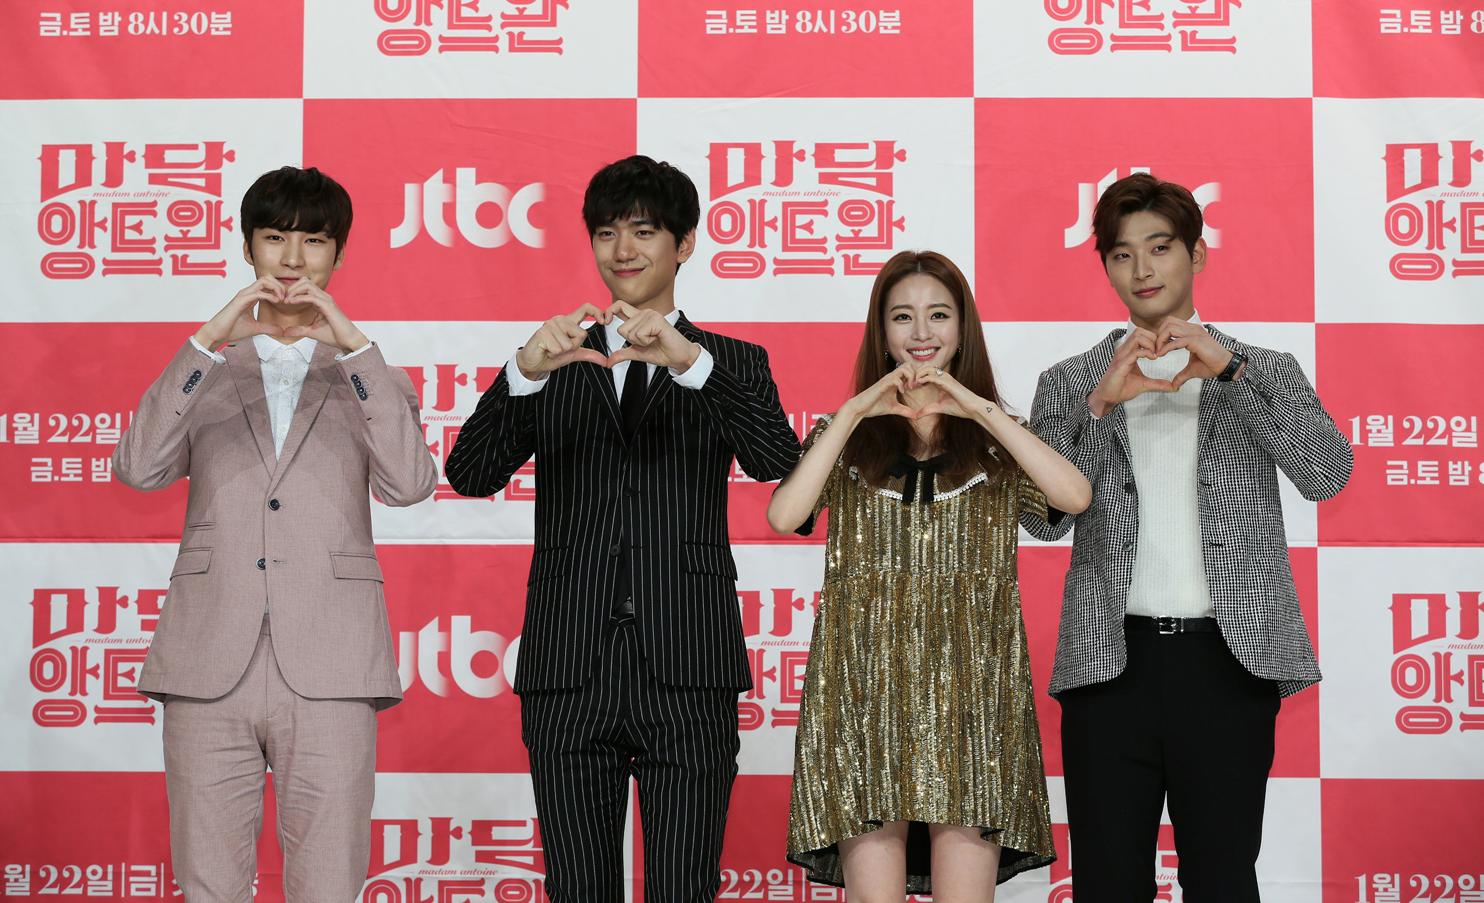 Lee-Joo-Hyung-Sung-Joon-Han-Ye-Seul-Jung-Jin-Woon